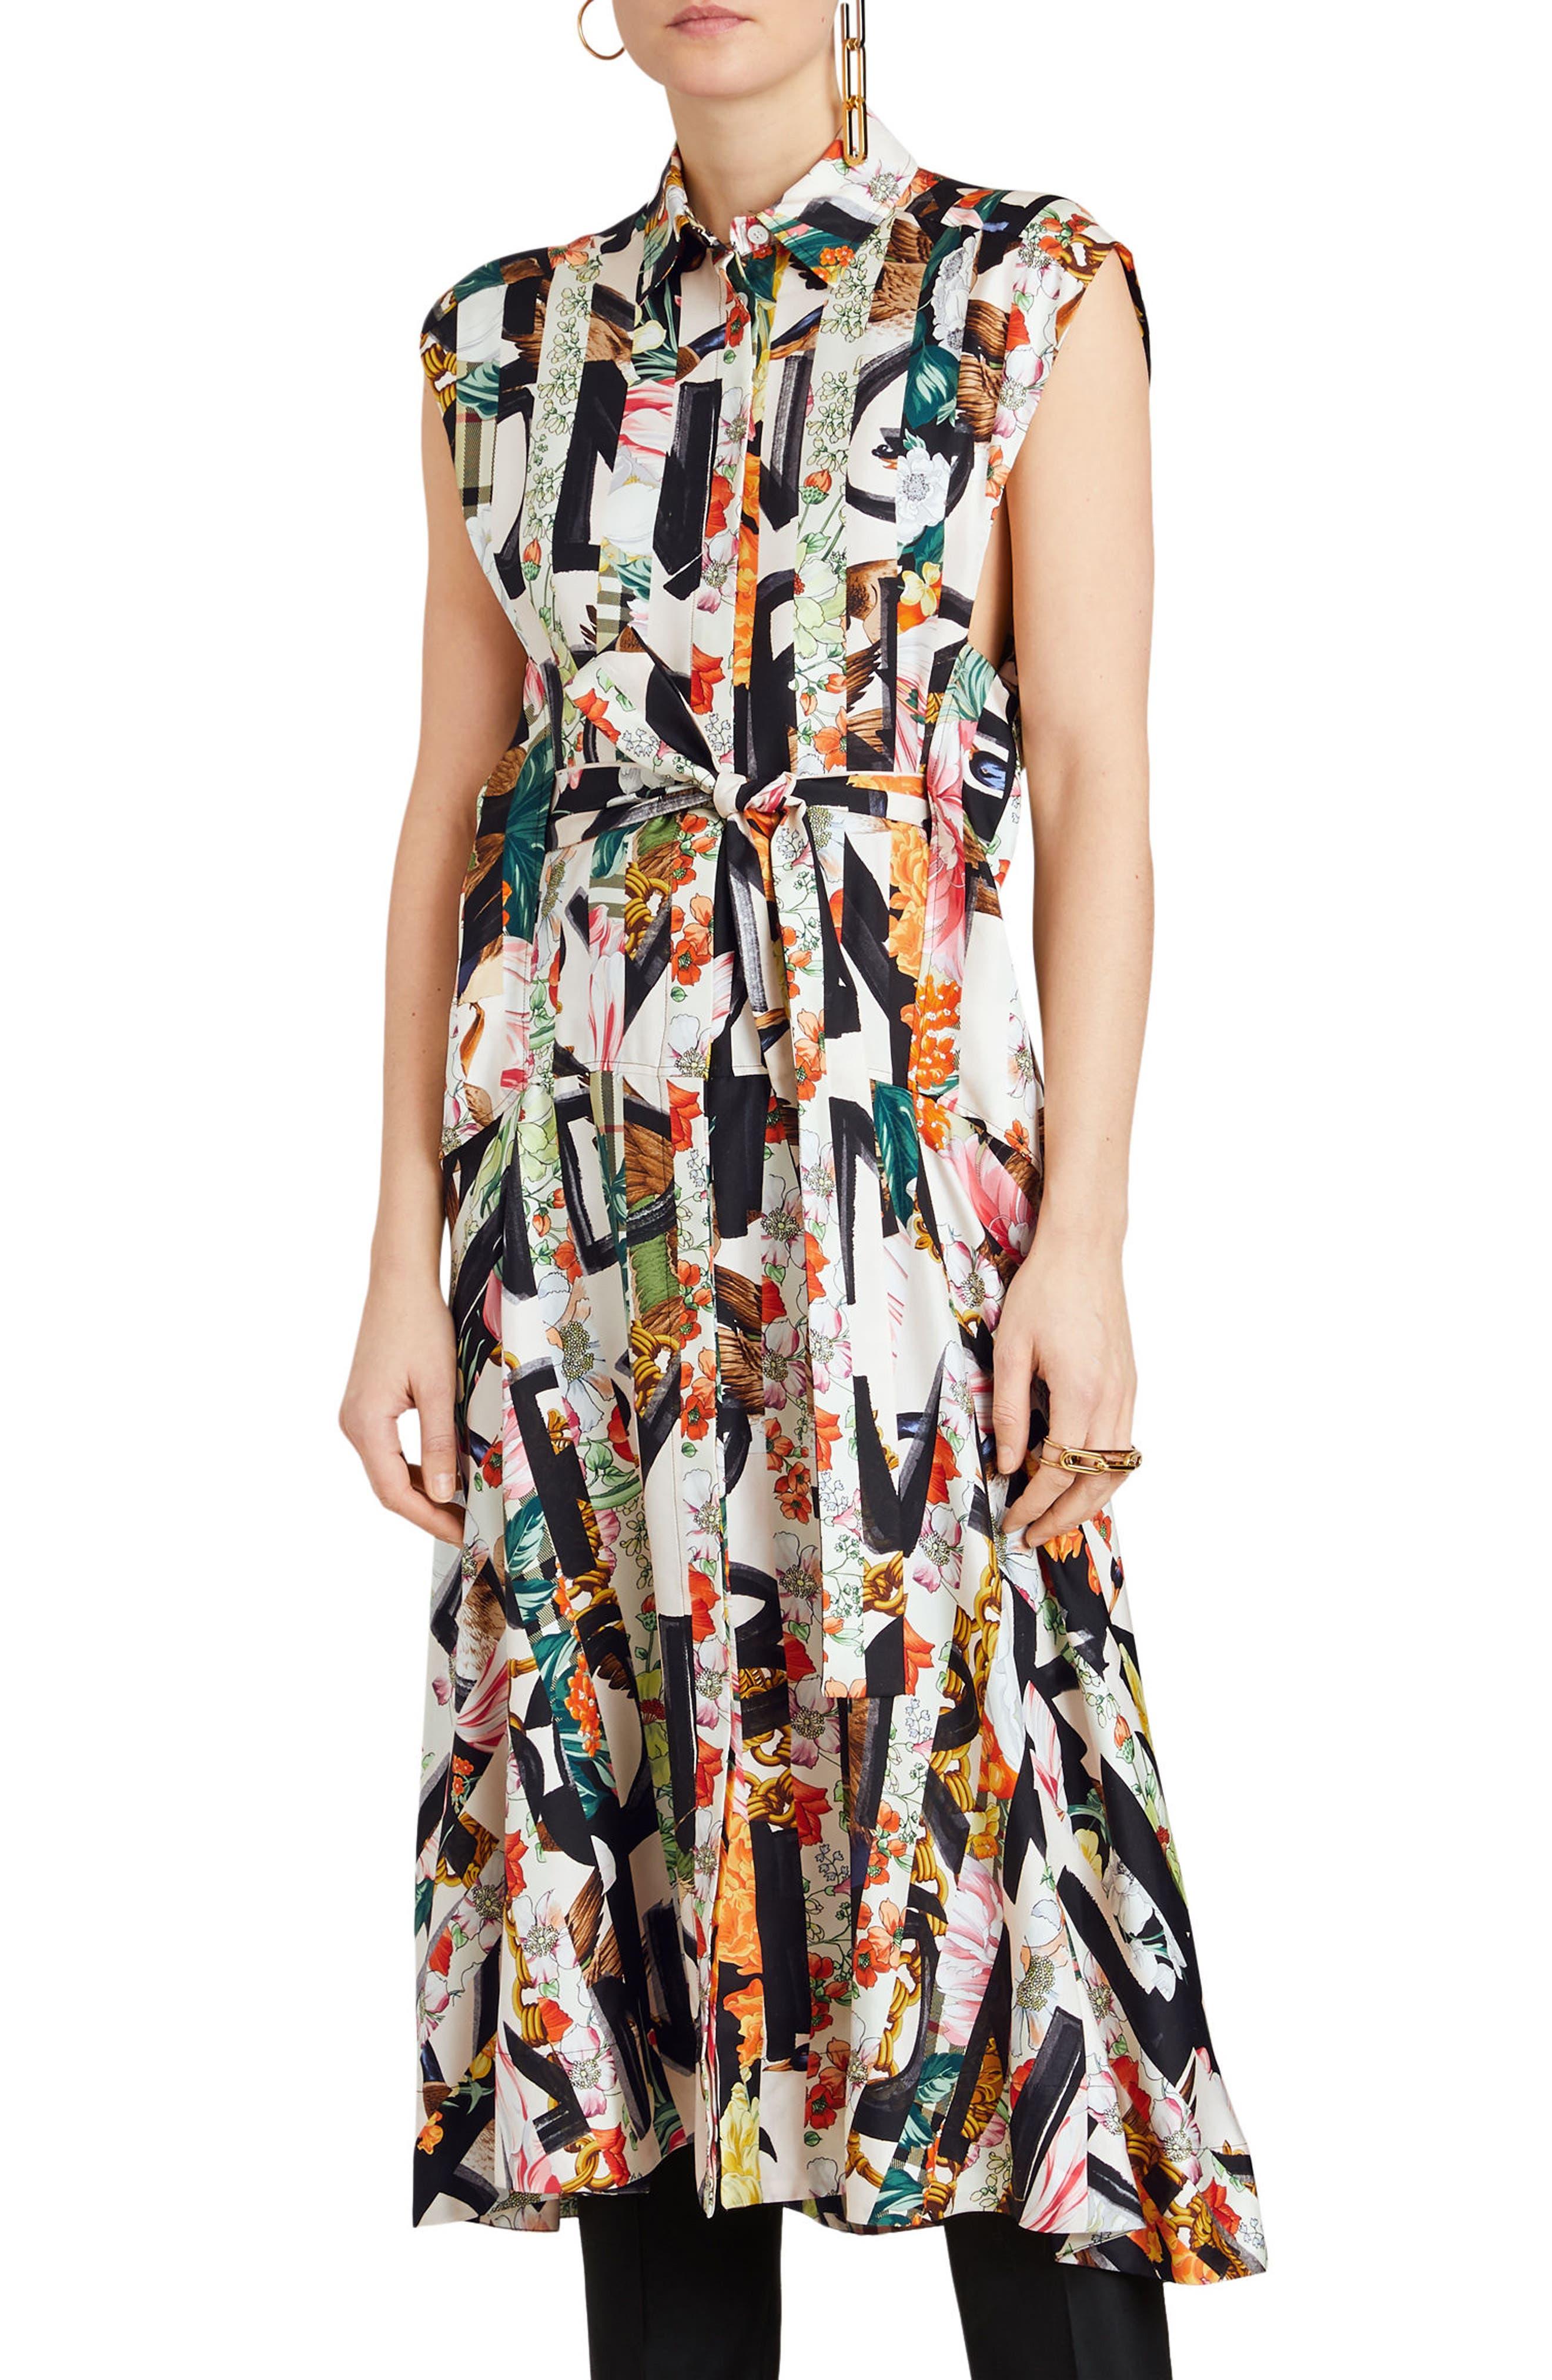 Sacha Silk Dress,                             Main thumbnail 1, color,                             MULTICOLOUR IP PTTN